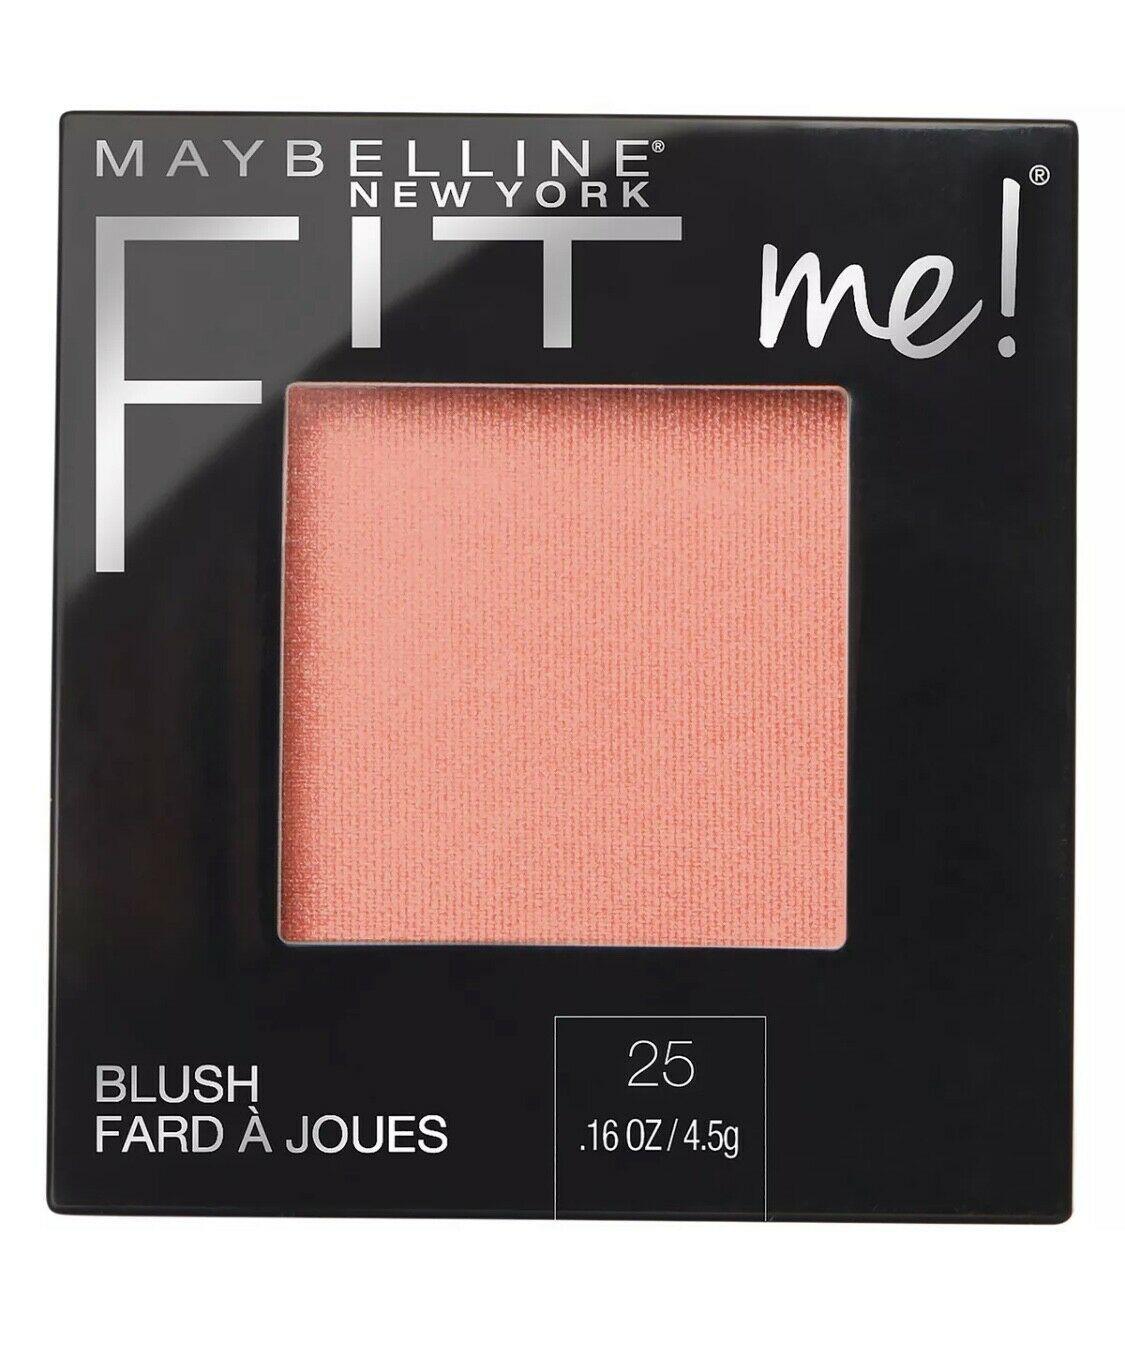 Maybelline Fit Me Blush 0.16 oz.  Beauty Makeup Skin Tone Enhancer - $7.99